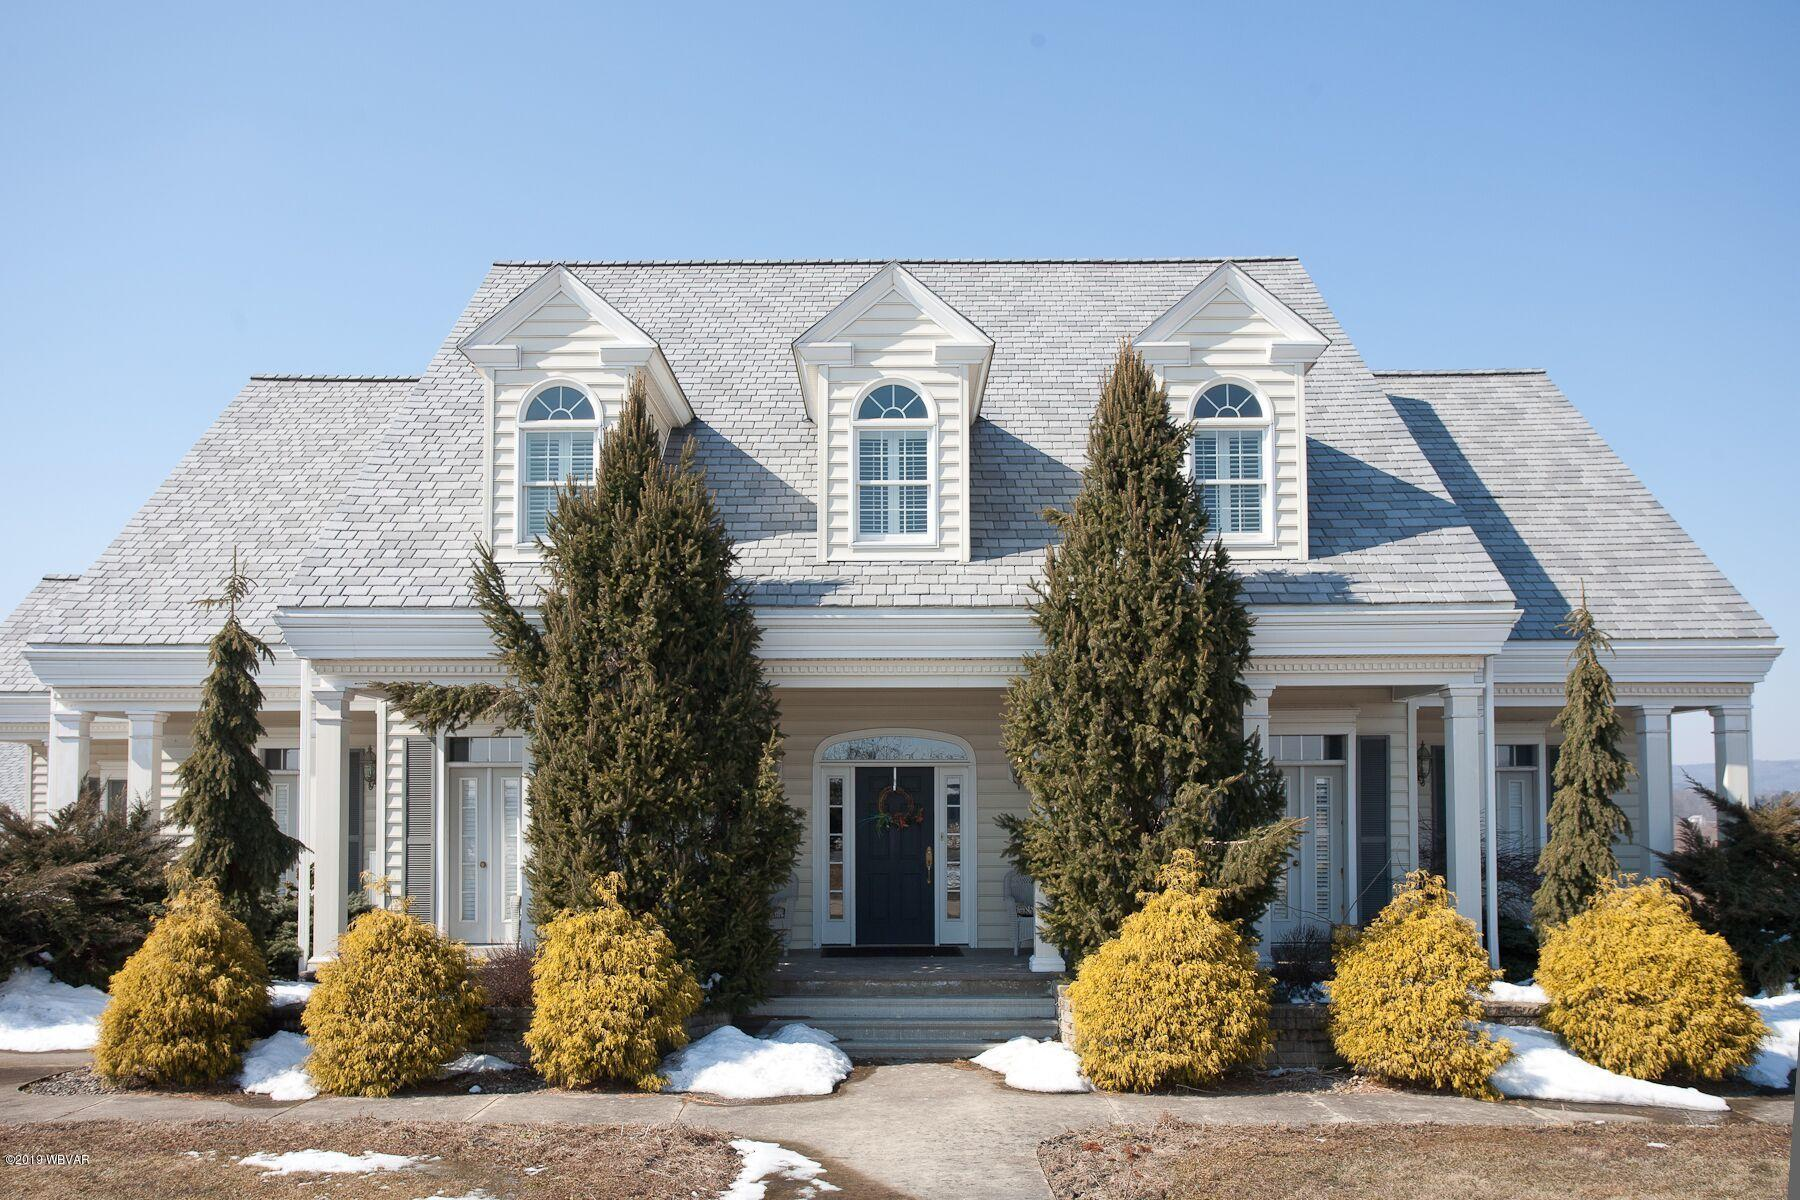 909 WARRIOR RUN BOULEVARD,Turbotville,PA 17772,6 Bedrooms Bedrooms,7 BathroomsBathrooms,Residential,WARRIOR RUN,WB-86601